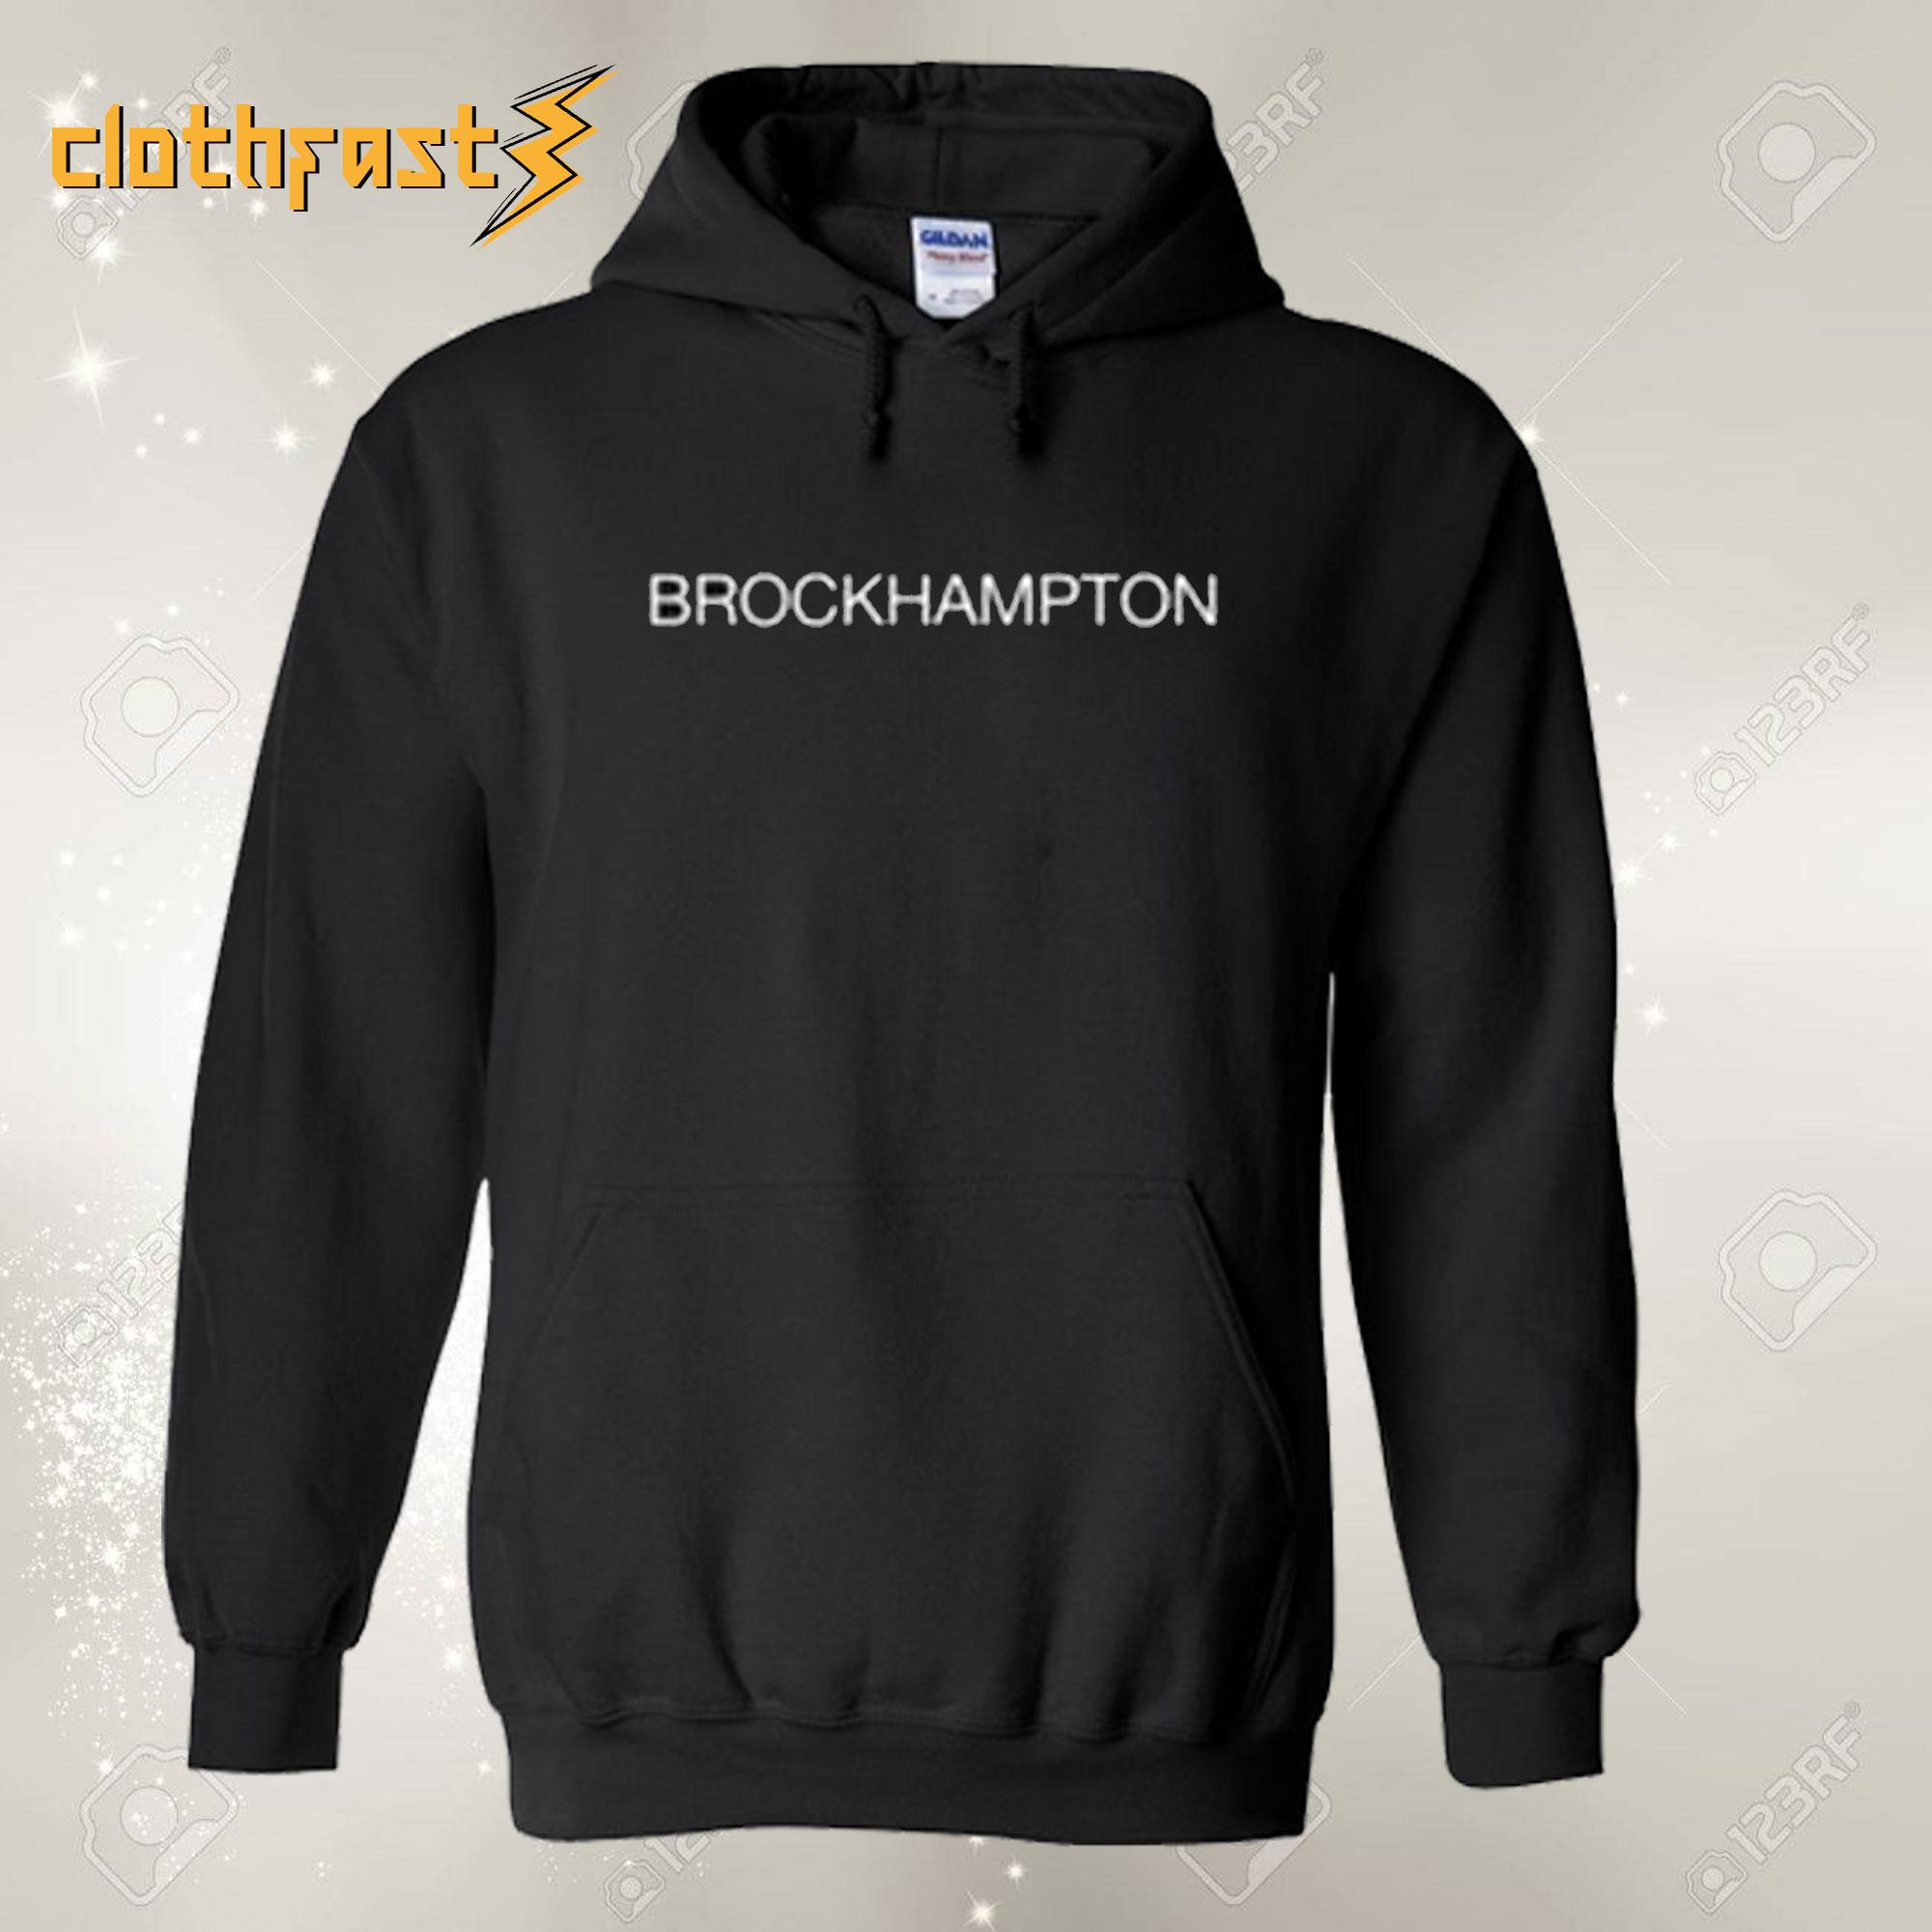 Brockhampton Hoodie